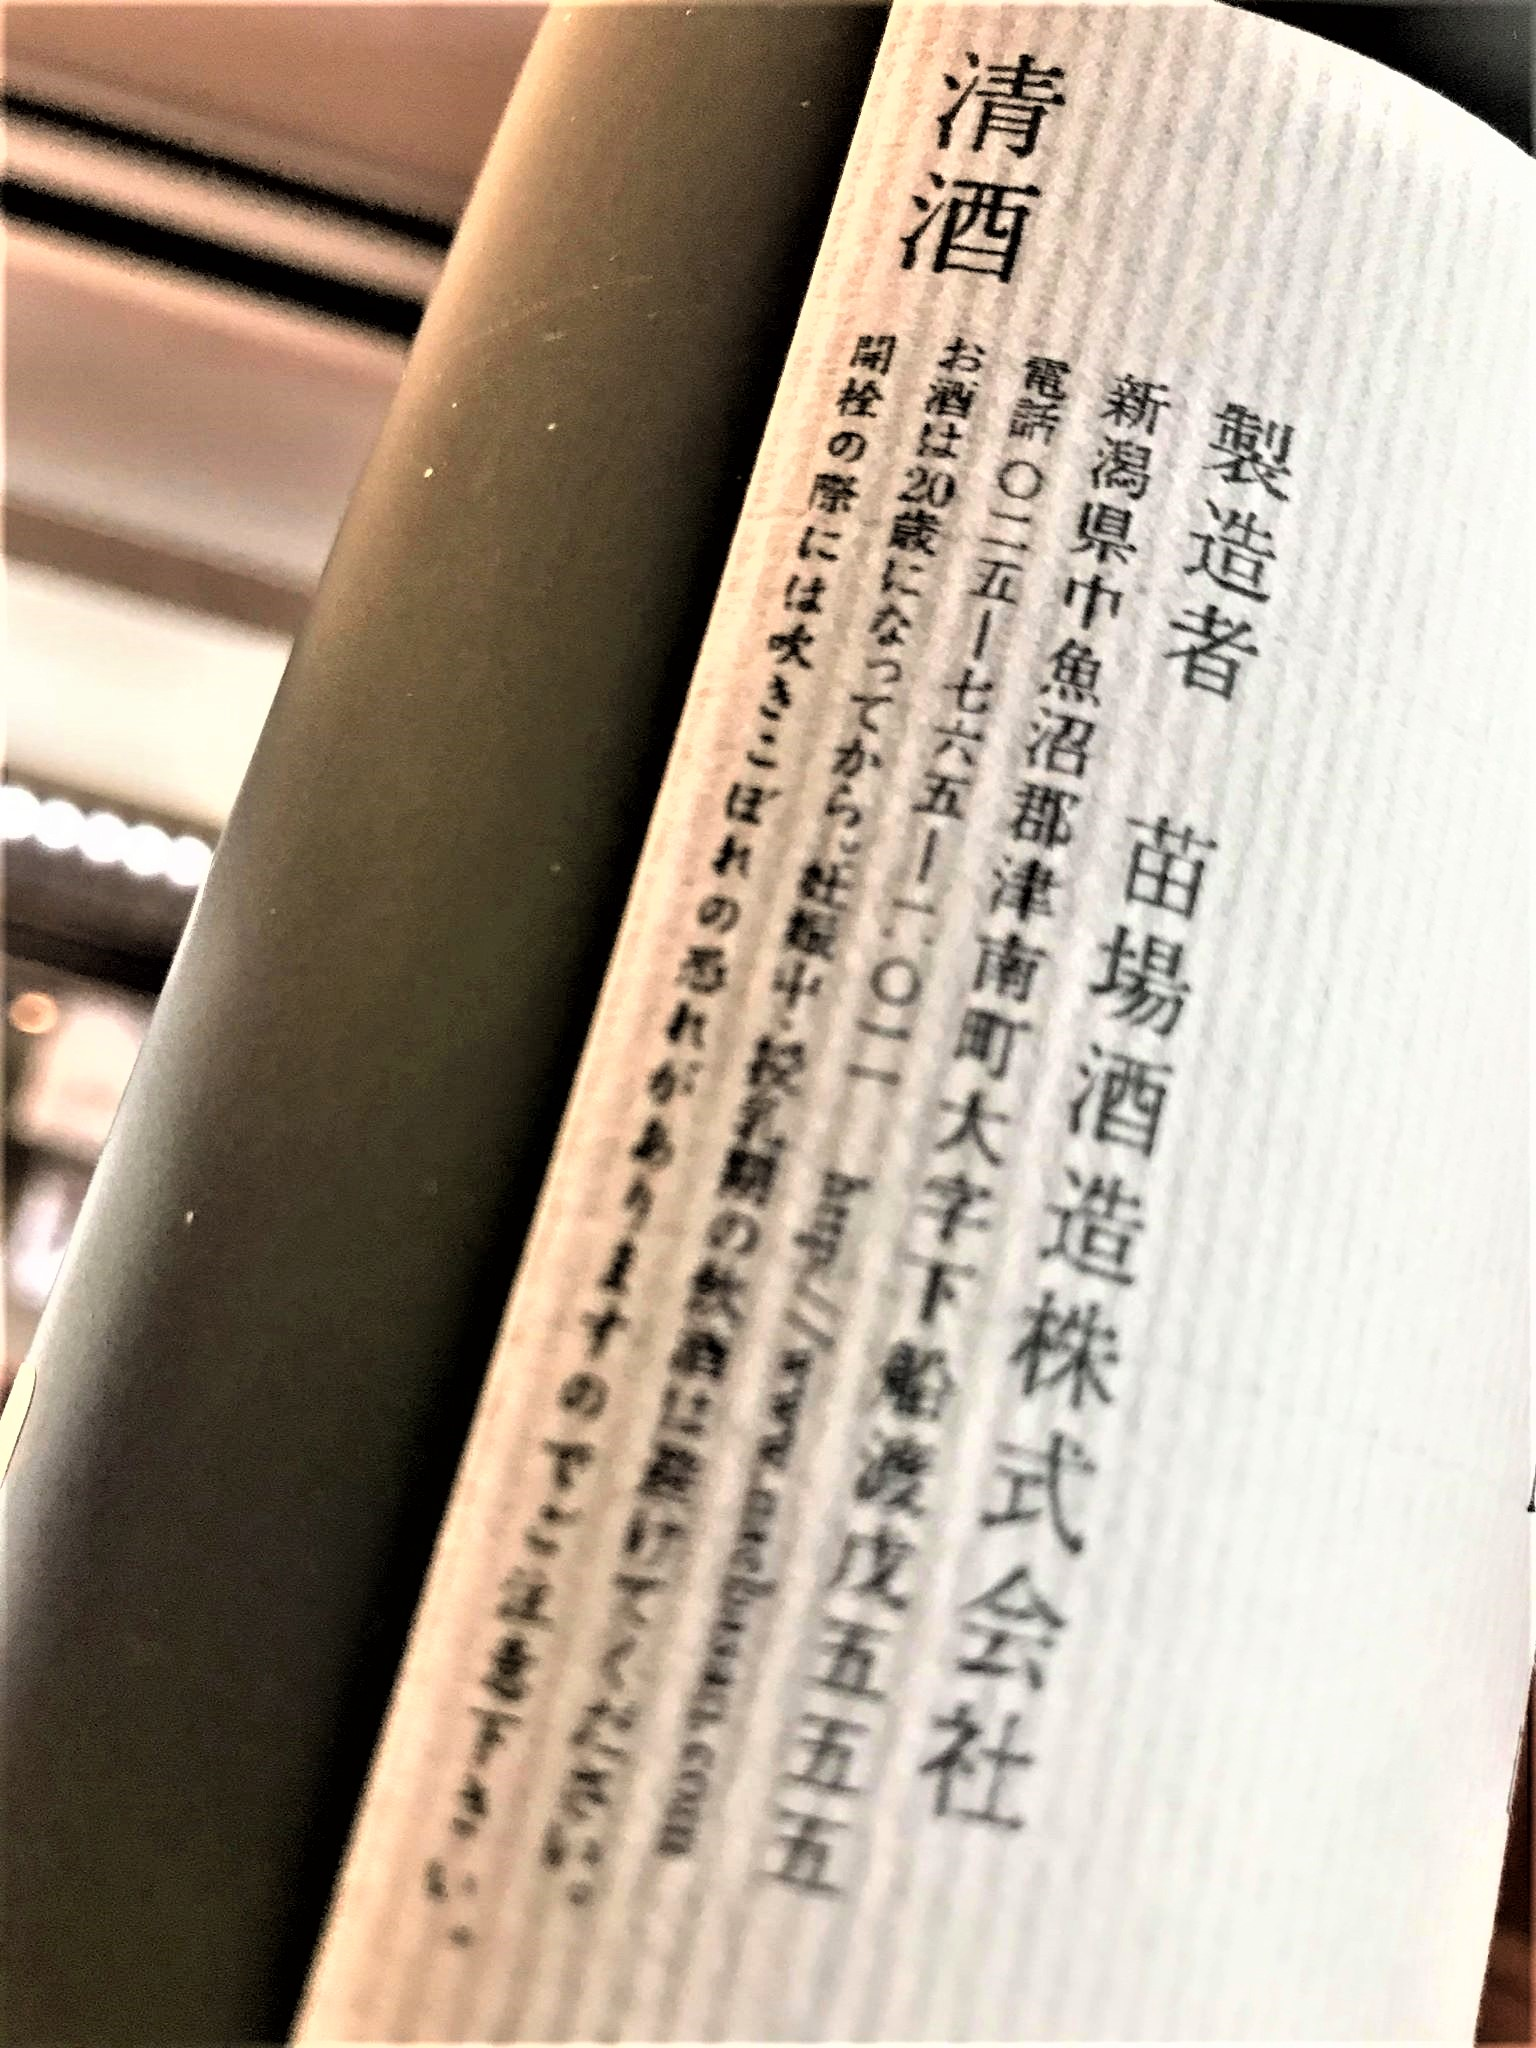 【日本酒】醸す森『kamosu mori』純米大吟醸生酒 五百万石50磨き 蔵元特別限定蔵出し 令和1BY🆕_e0173738_1872676.jpg